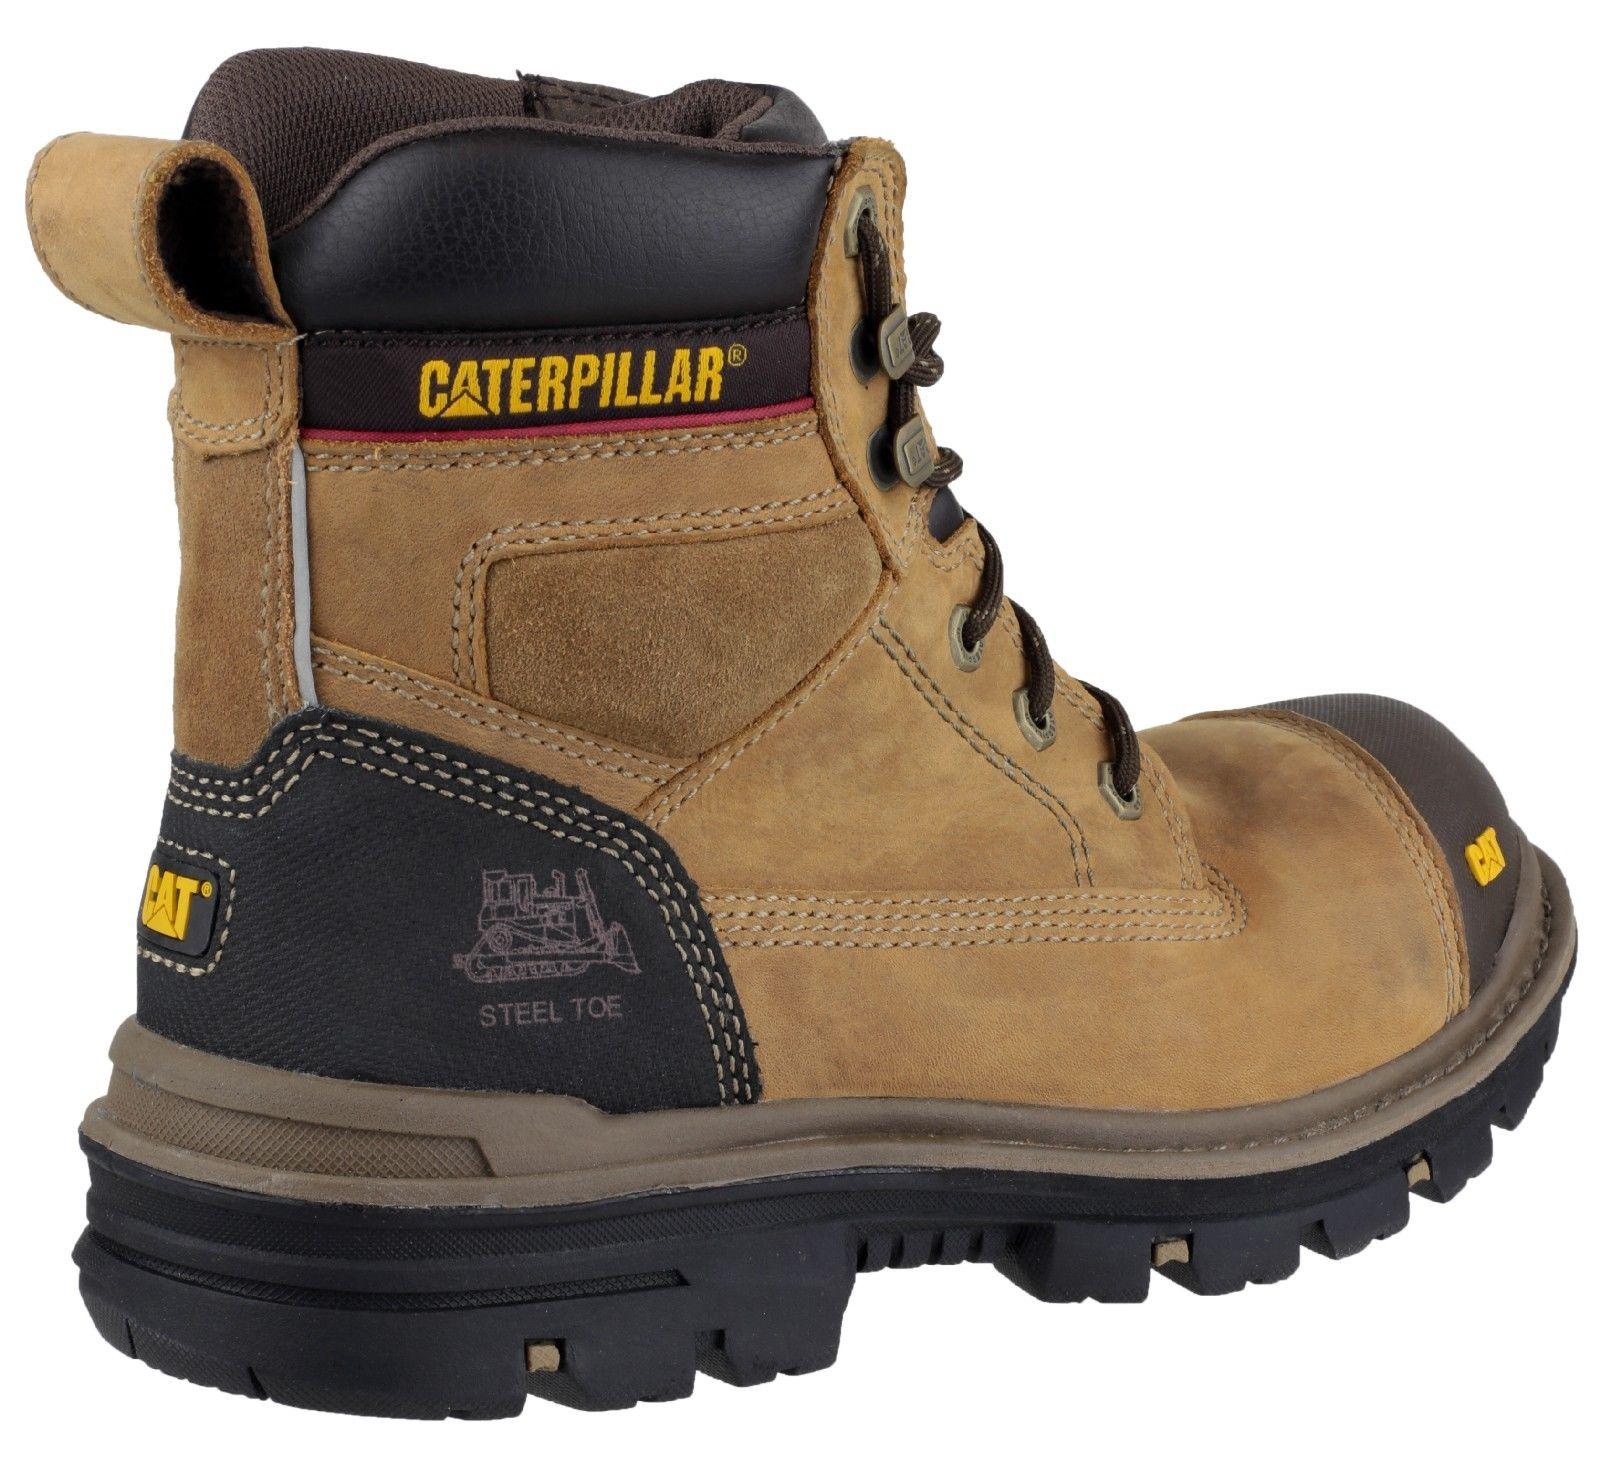 Mens CAT Caterpillar Gravel Steel Toe Cap Safety Work Boots Black